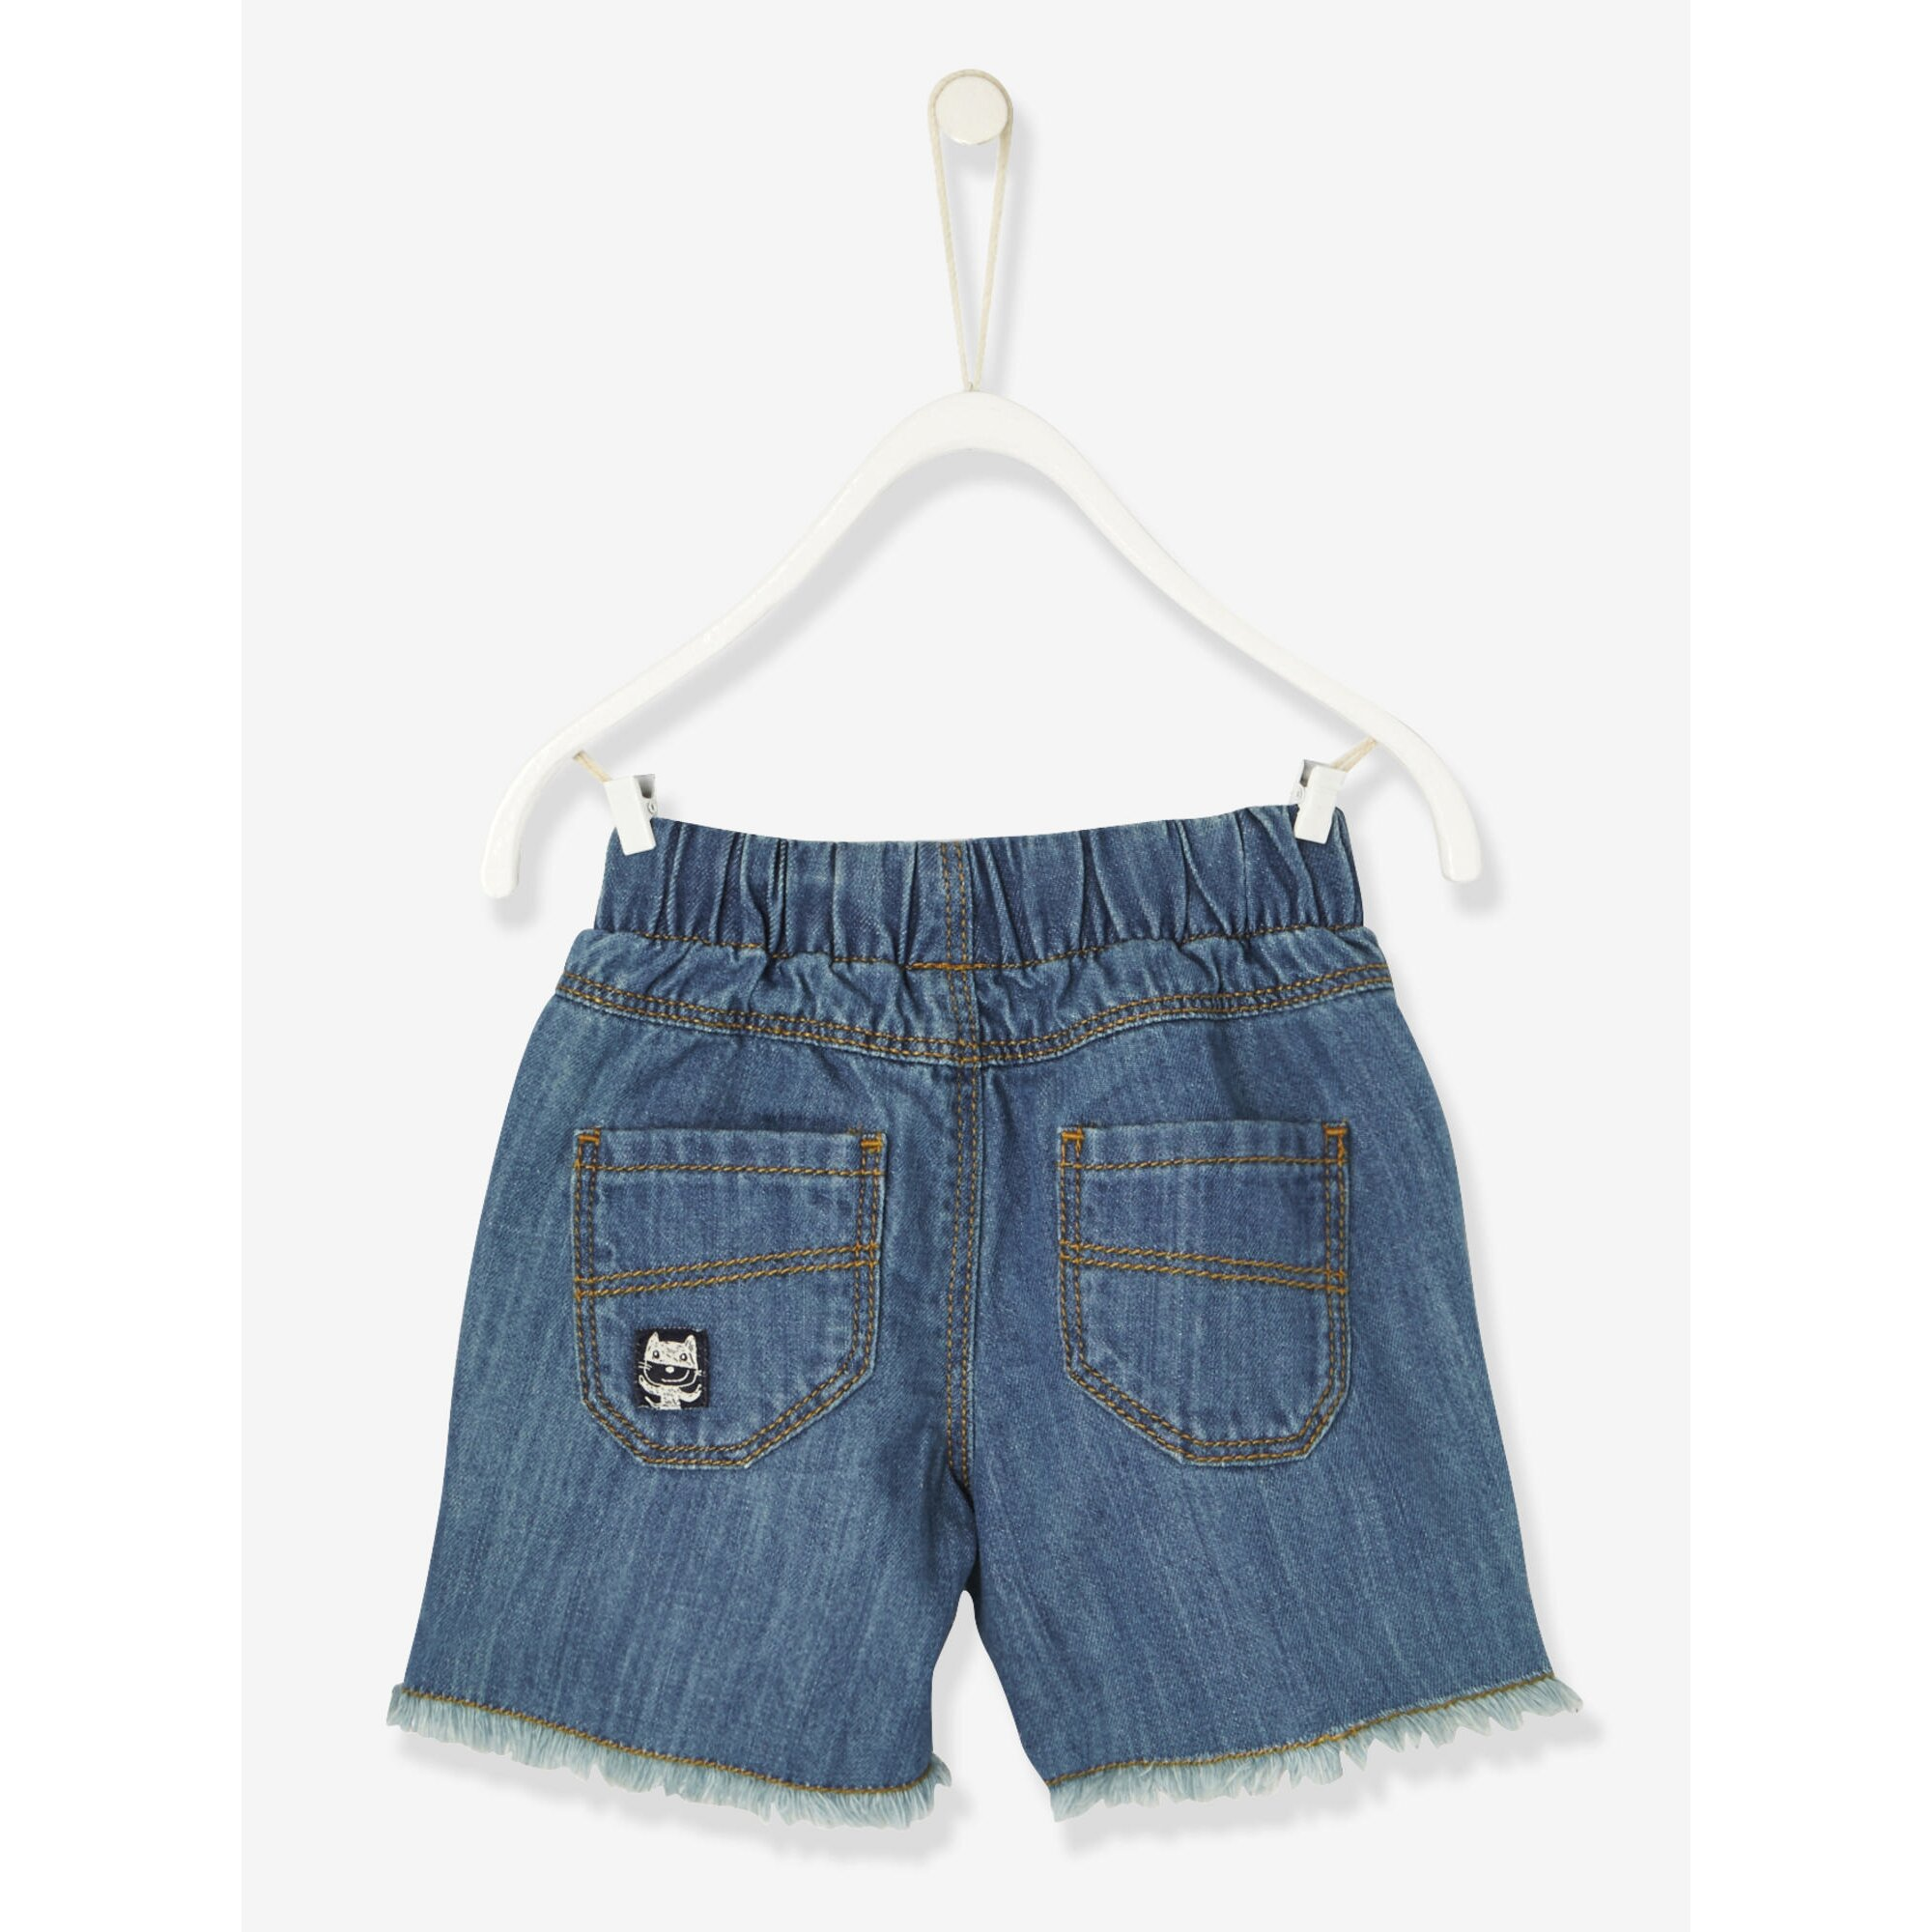 vertbaudet-jeans-bermudas-fur-baby-jungen, 7.79 EUR @ babywalz-de